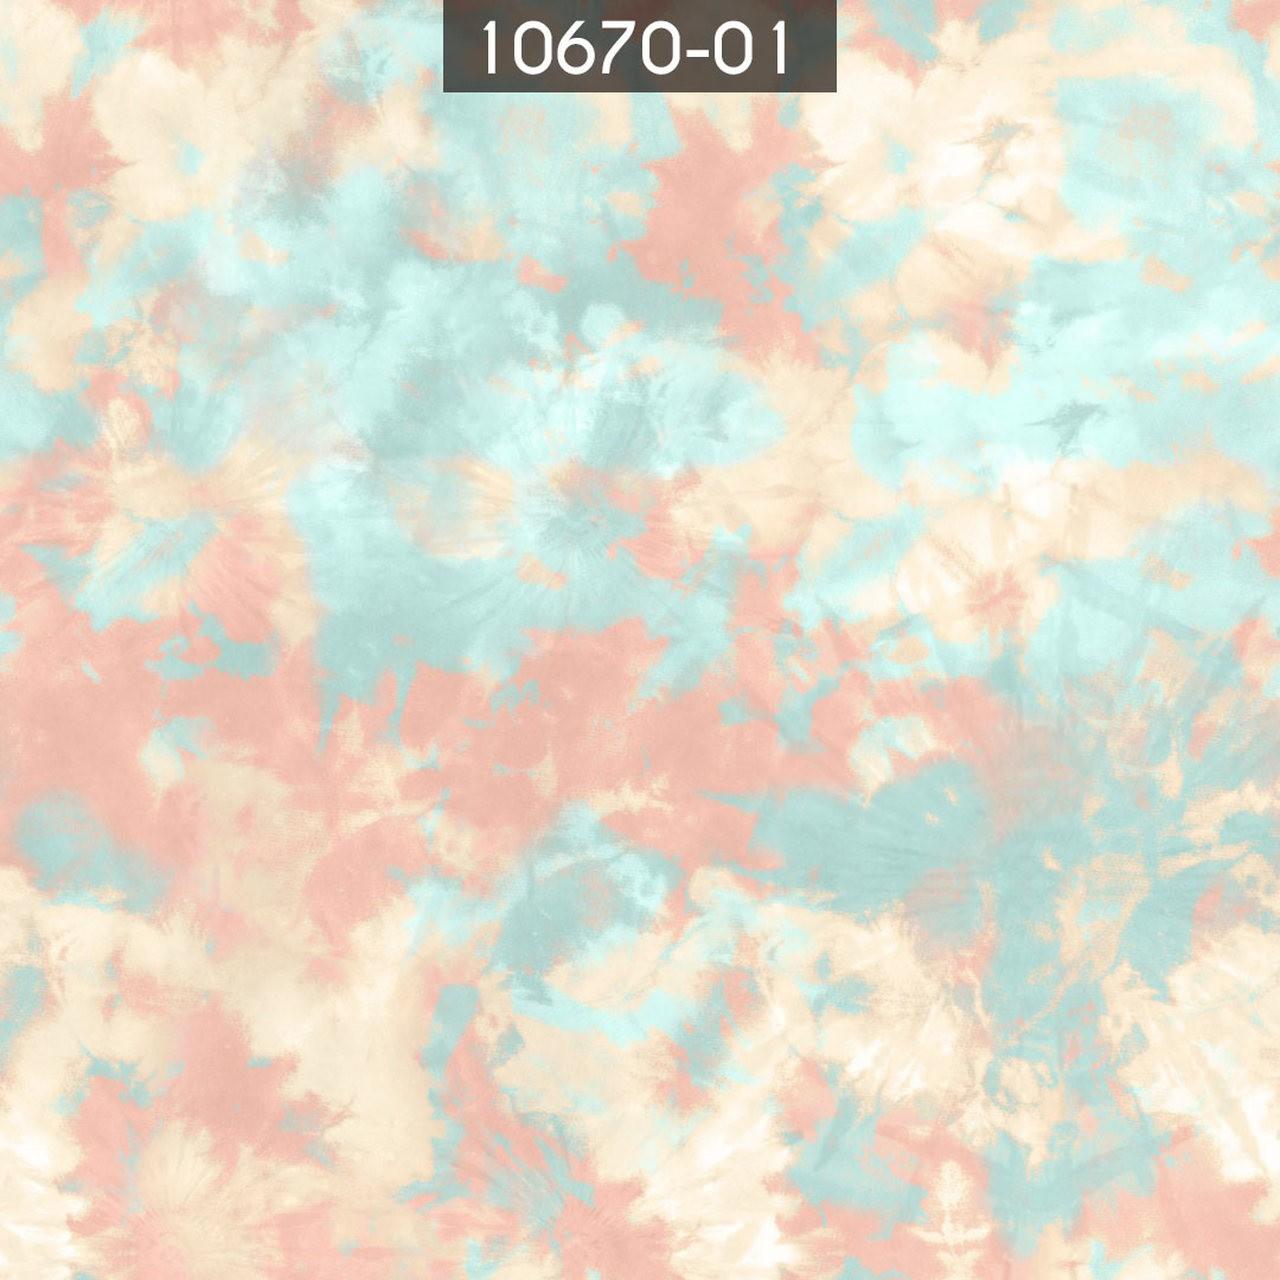 Tecido Seda Gloss Tie Dye 01